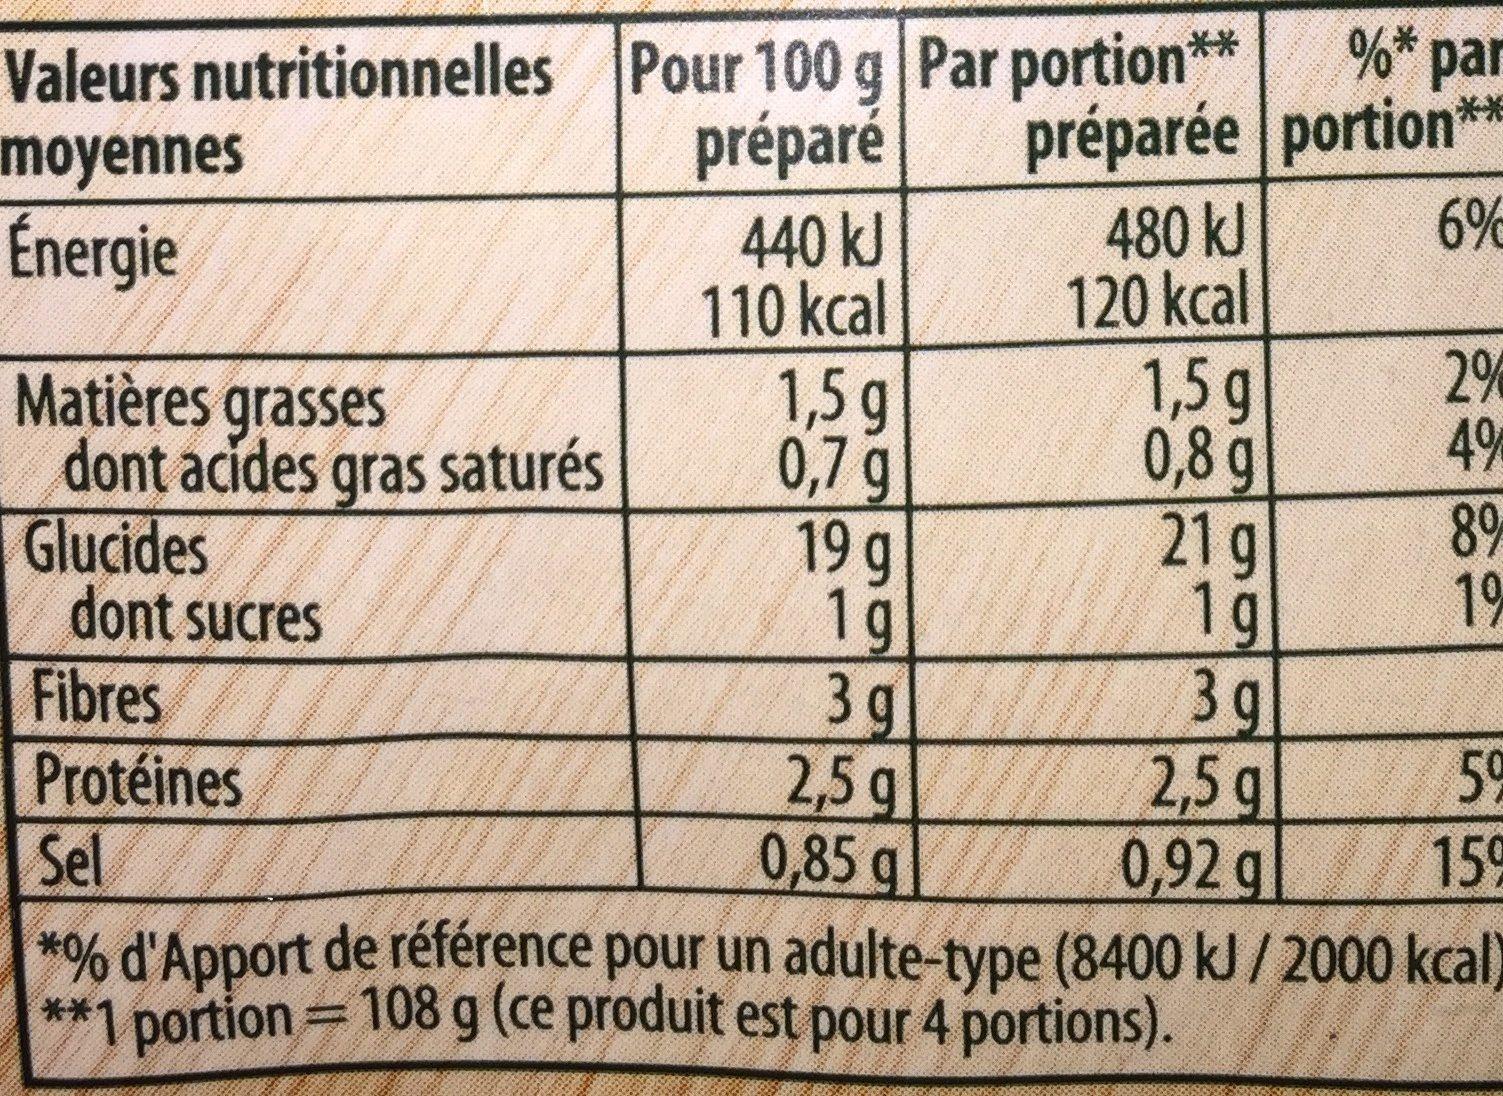 19G Kit Cuisson Potatoes Paprika Knorr - Informations nutritionnelles - fr